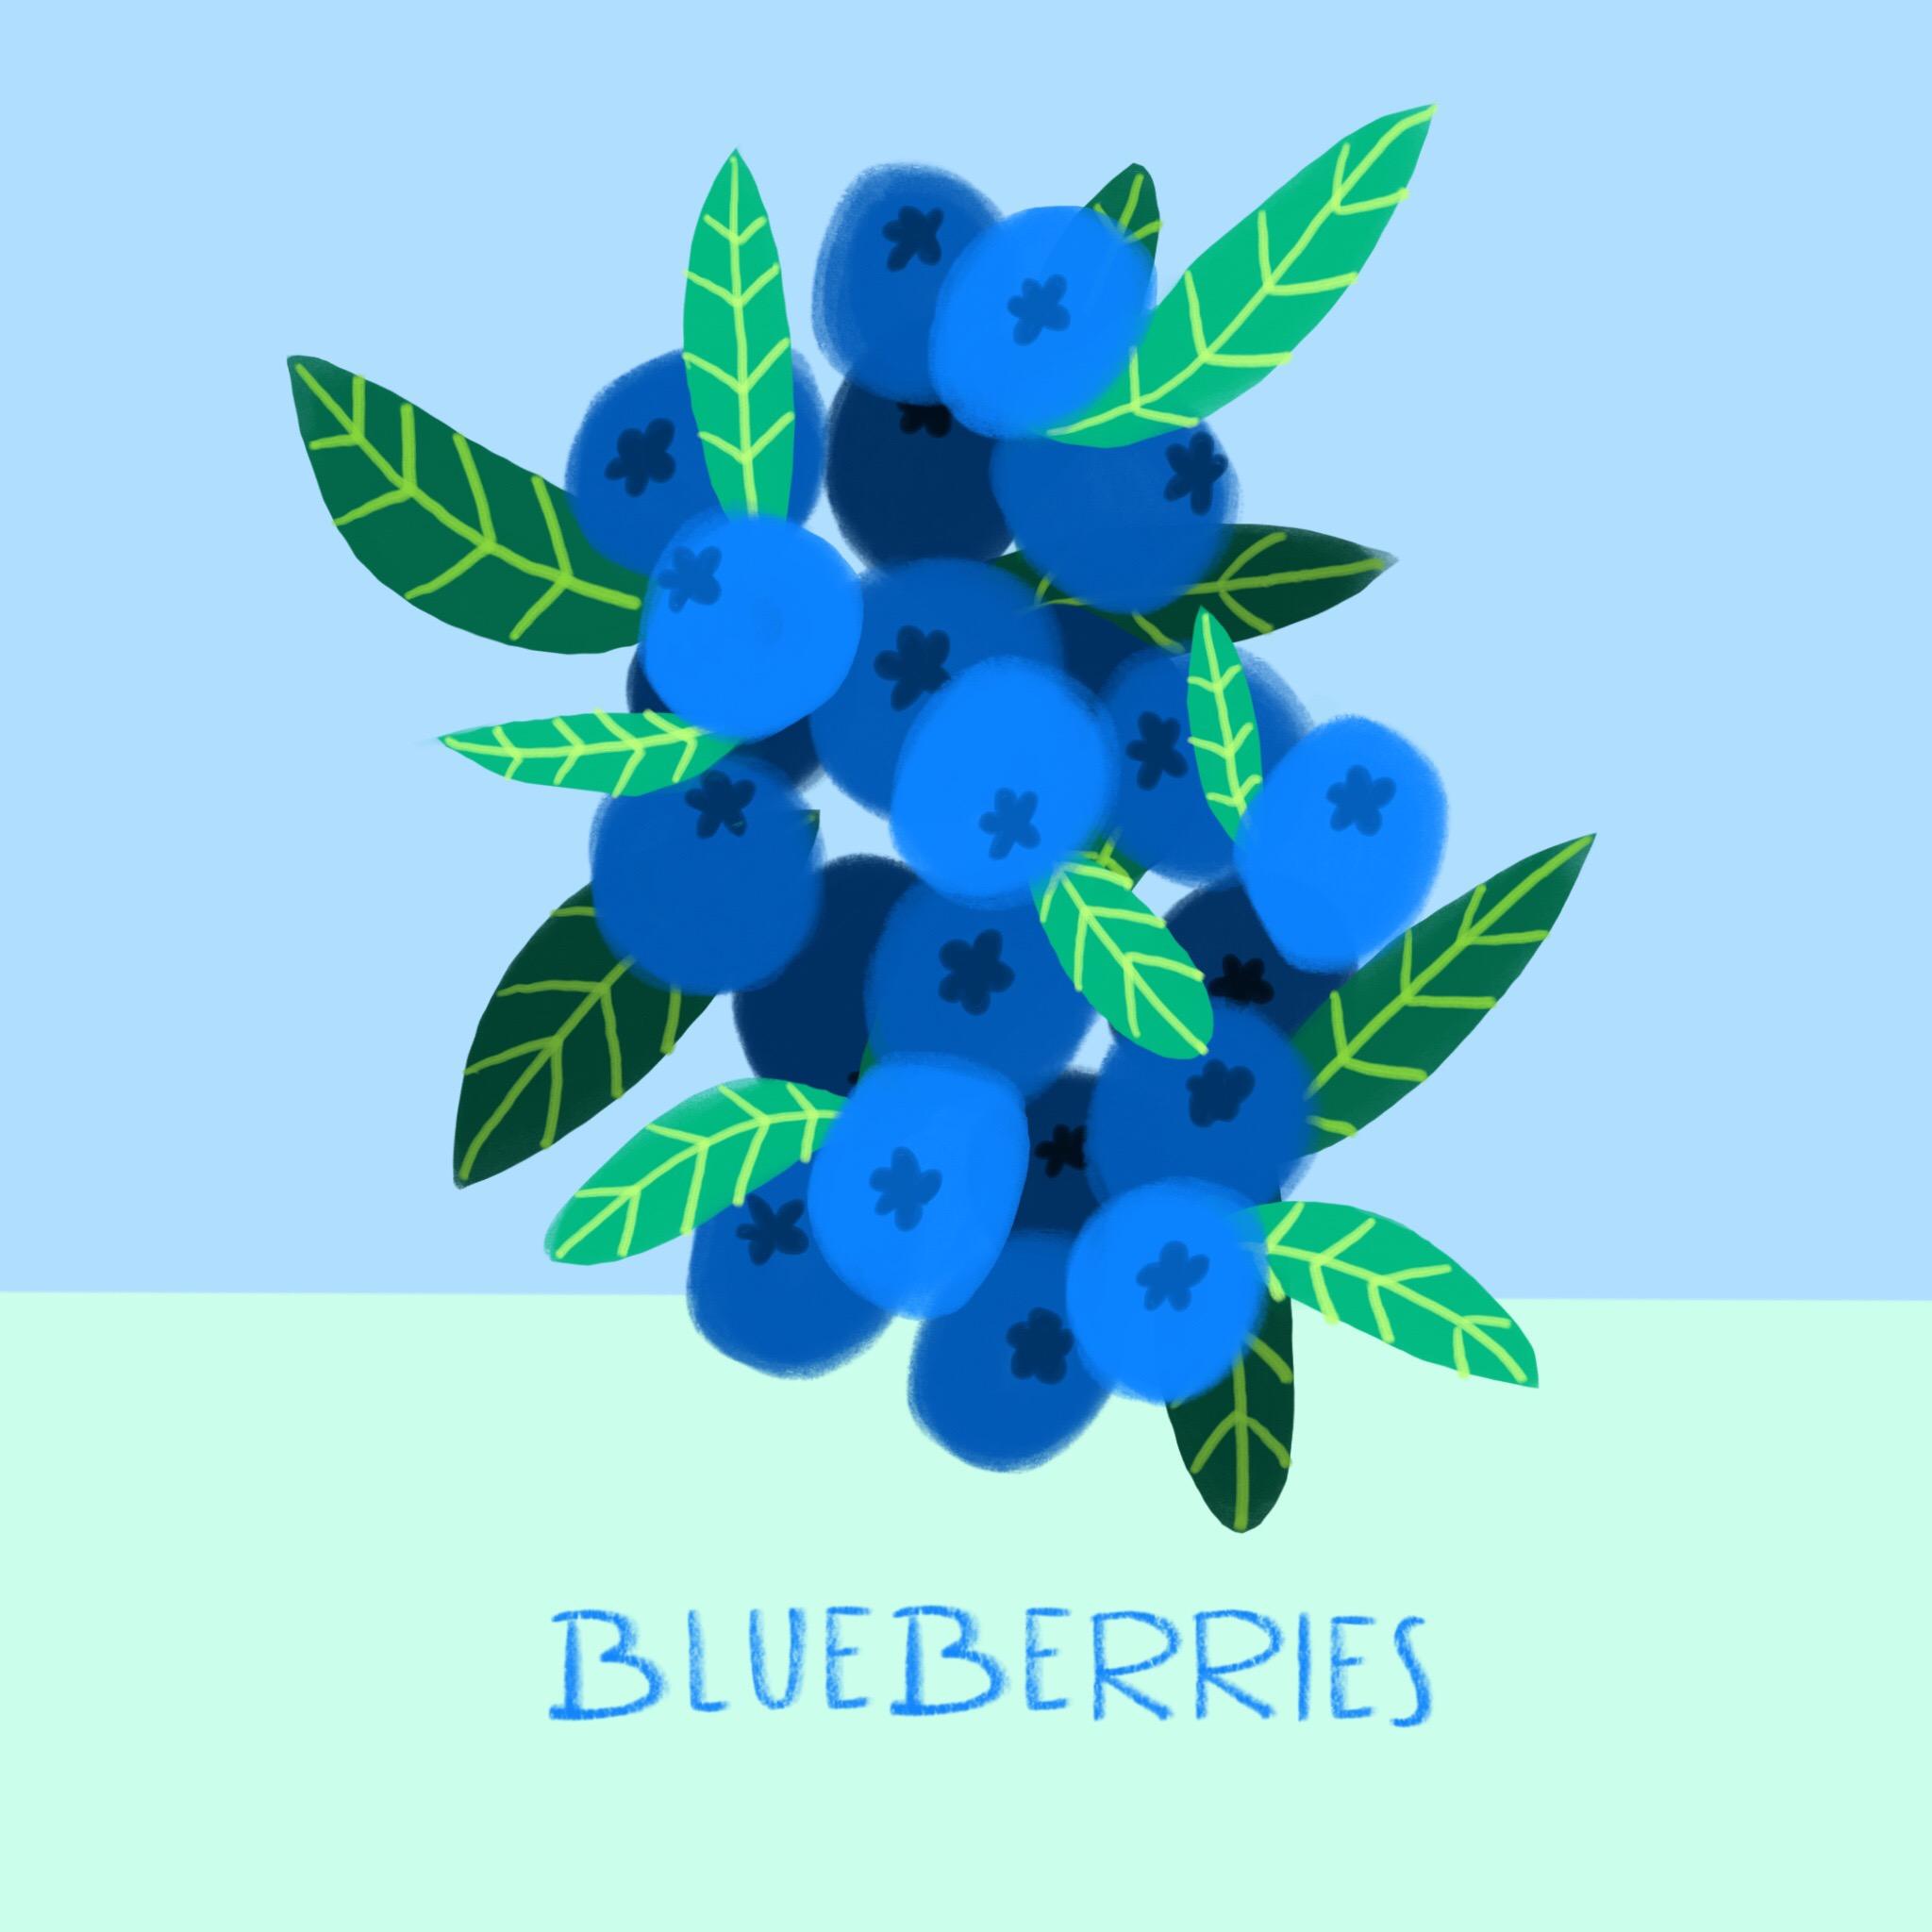 36_-_Blueberries.jpg